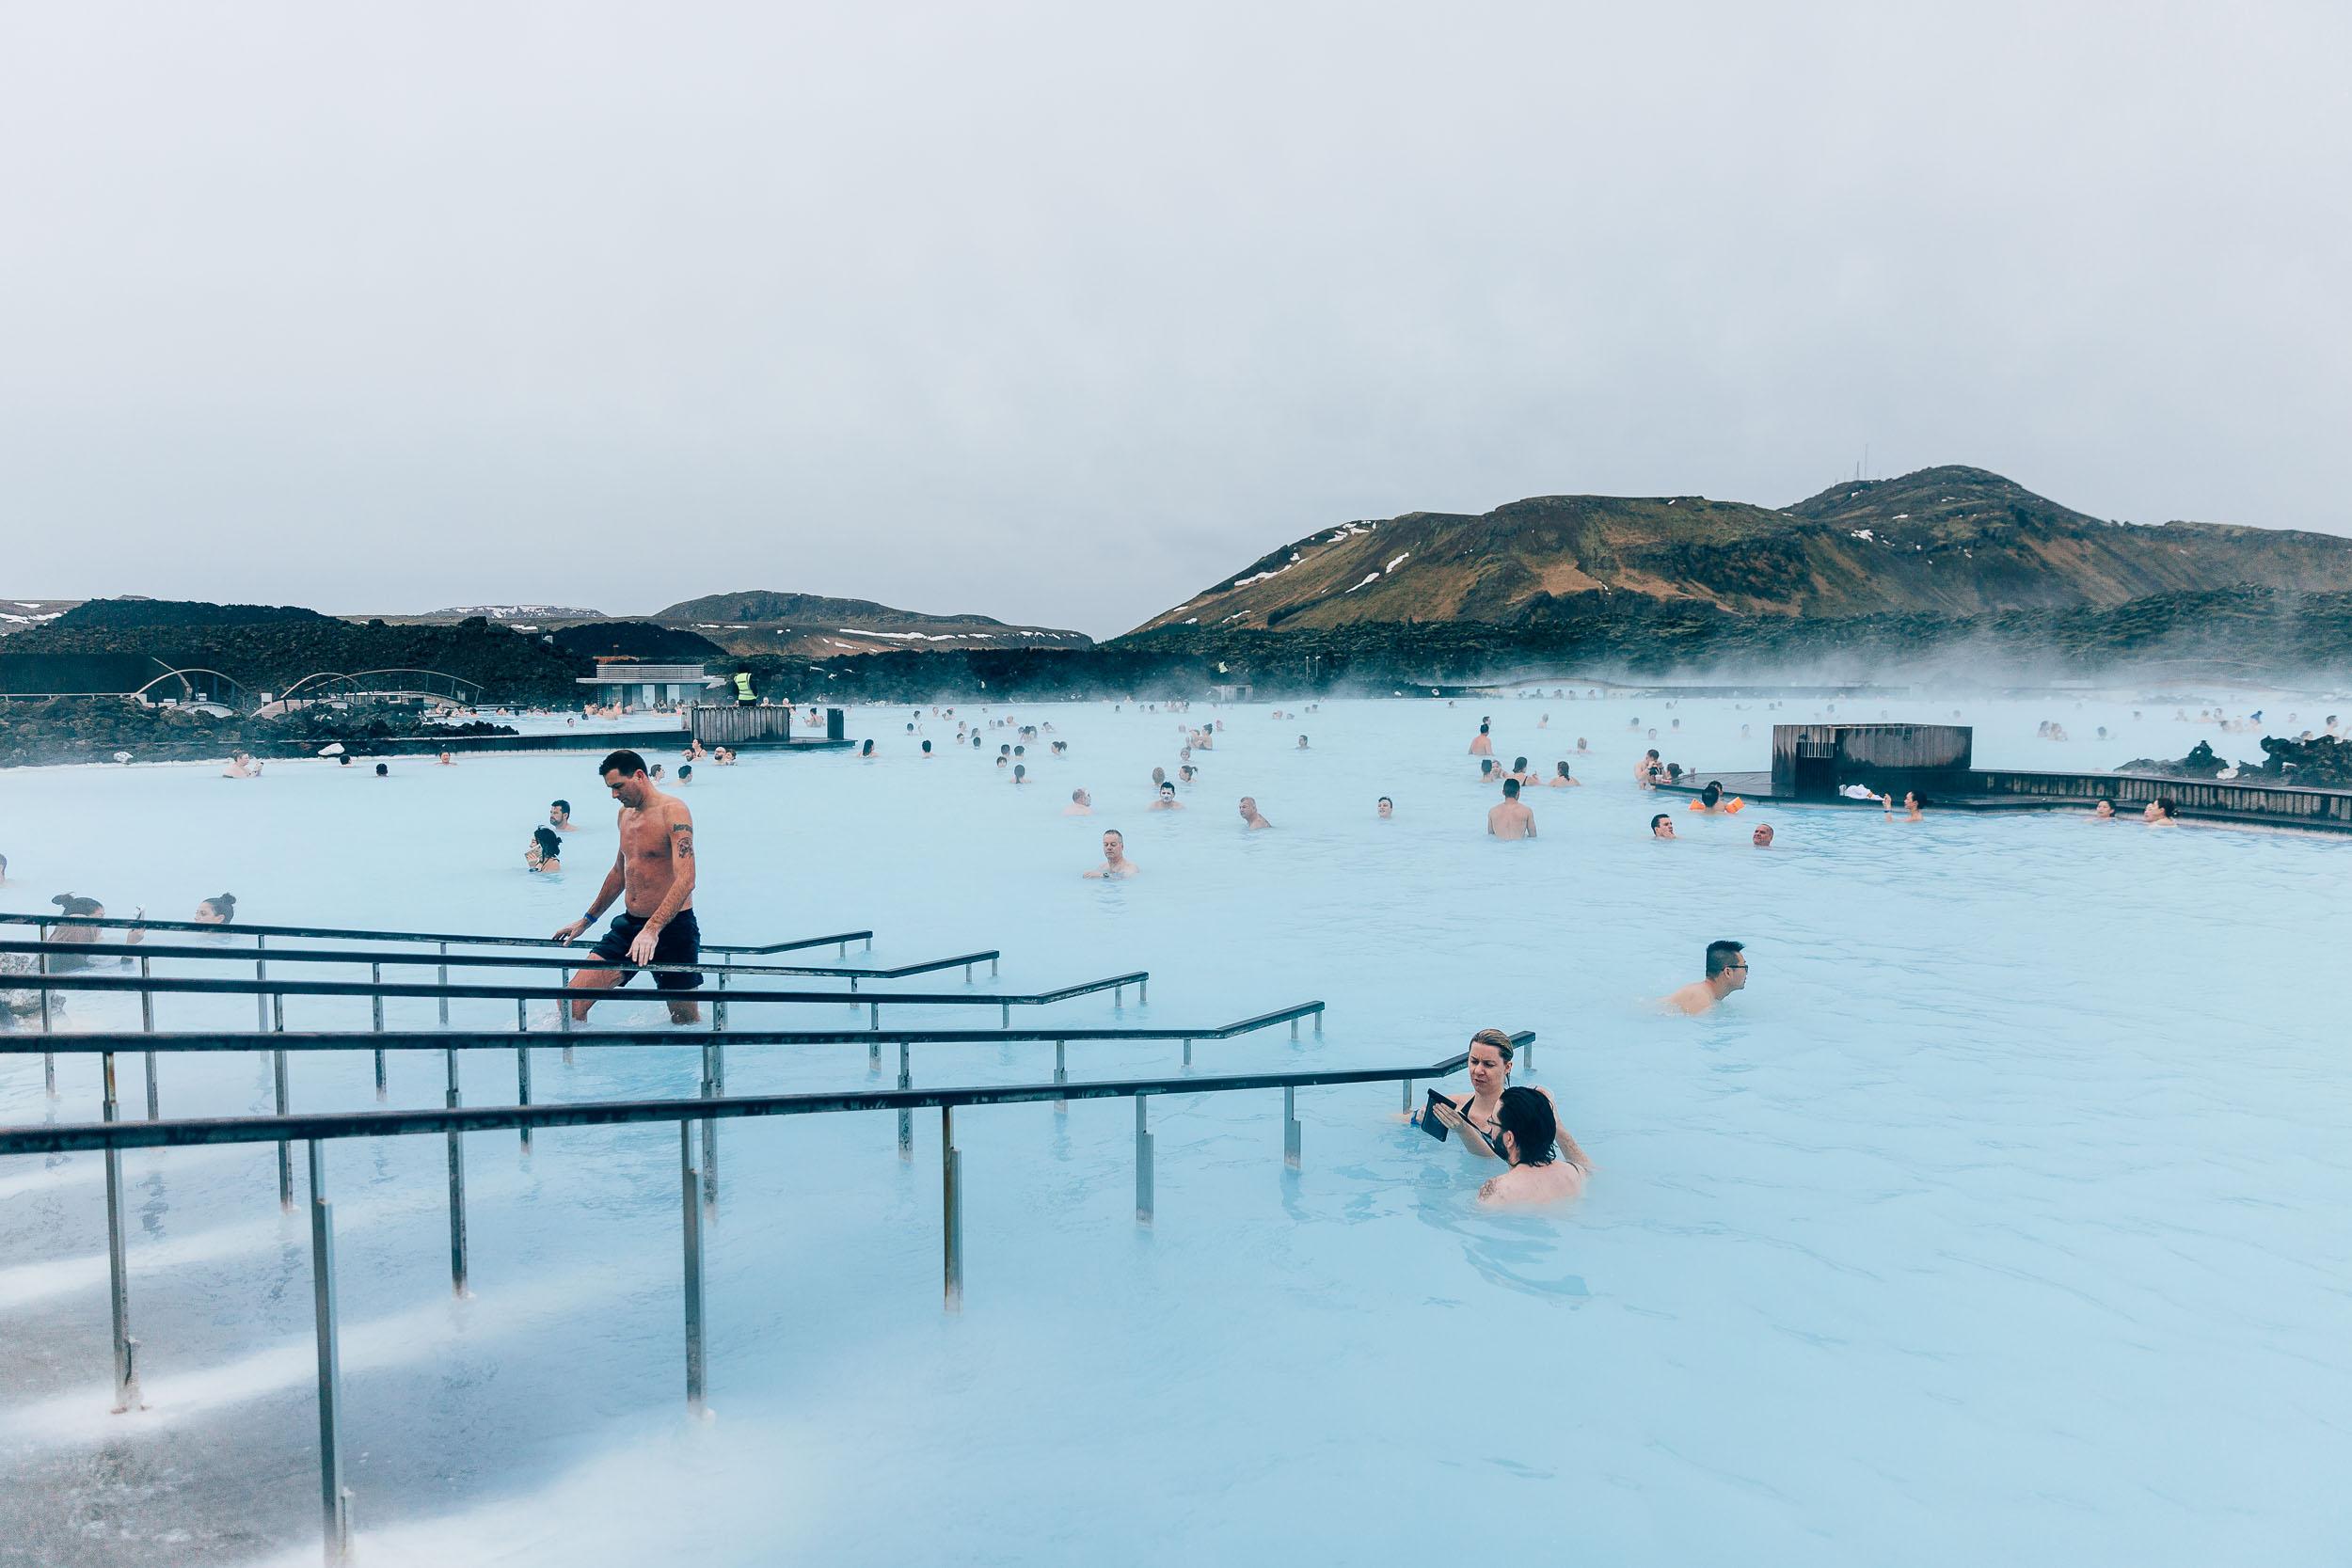 02_2019_Iceland-181.jpg